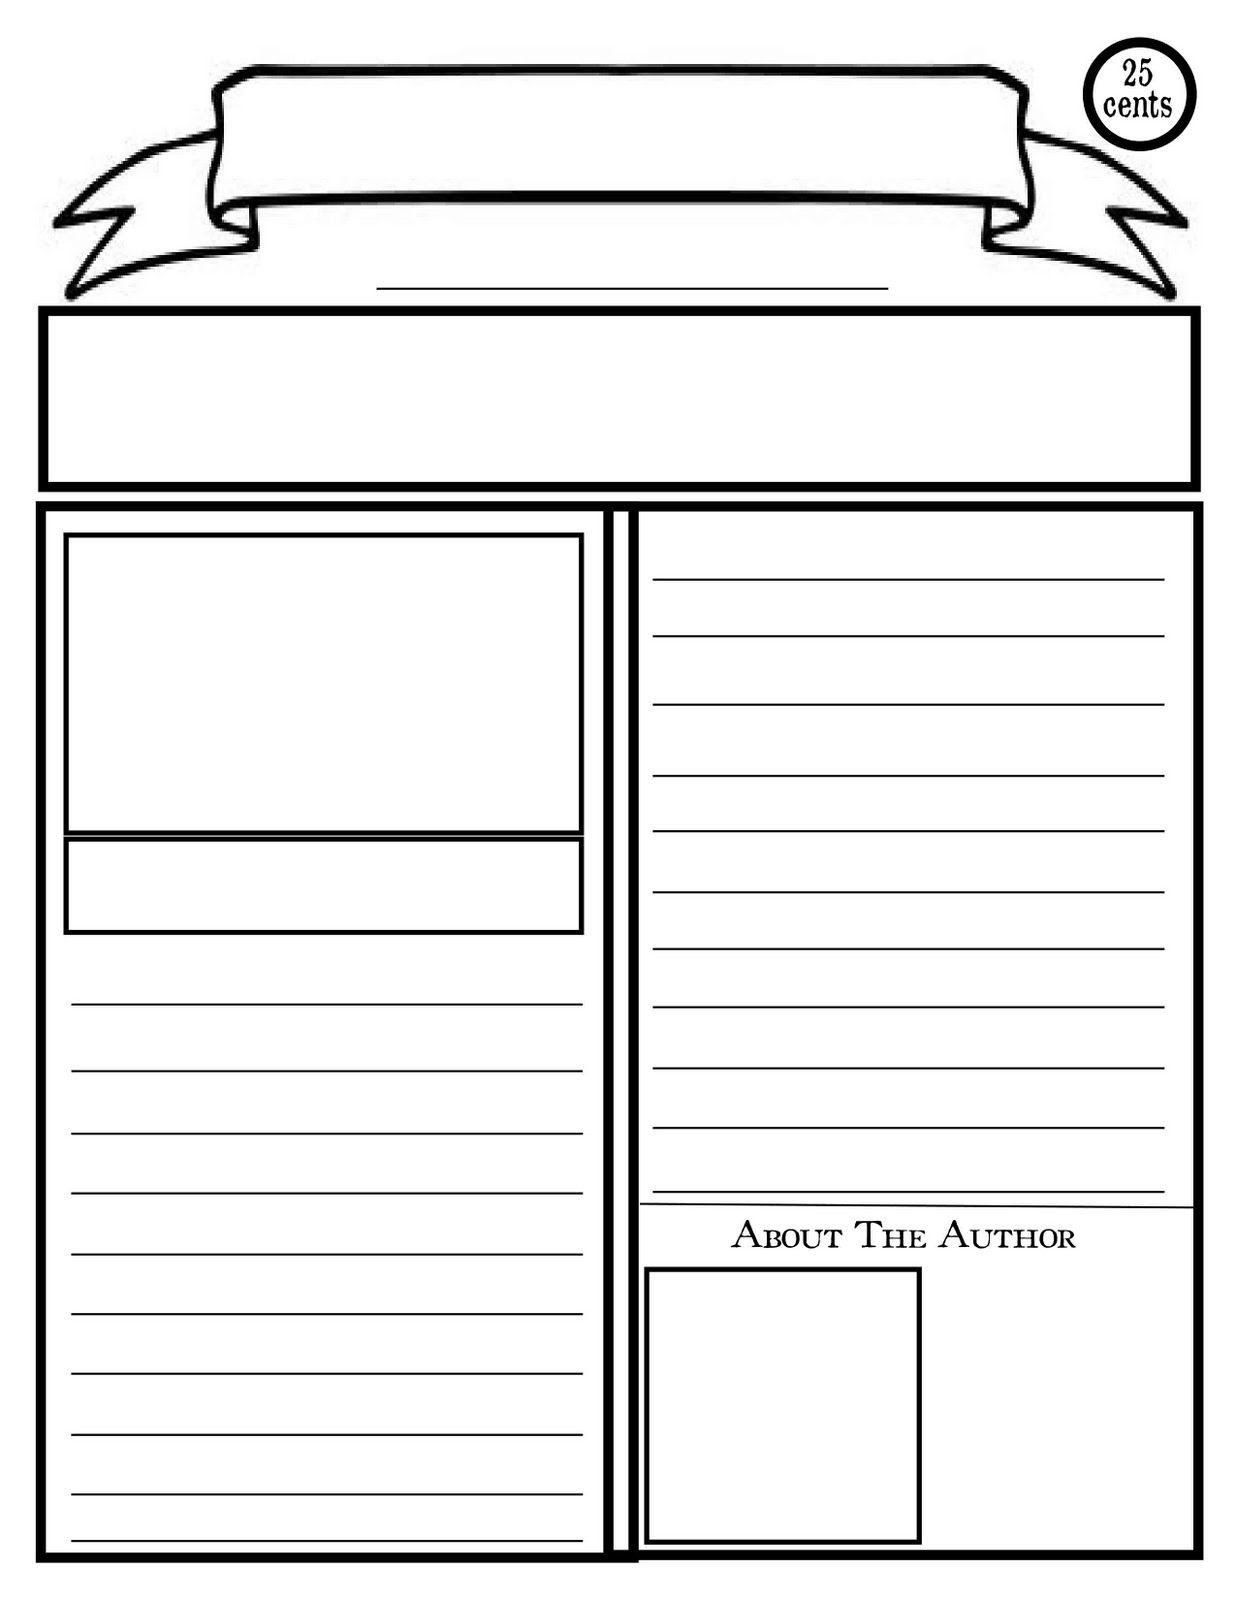 Blank Newspaper Template For Kids Printable   Homework Help - Free Printable Newsletter Templates